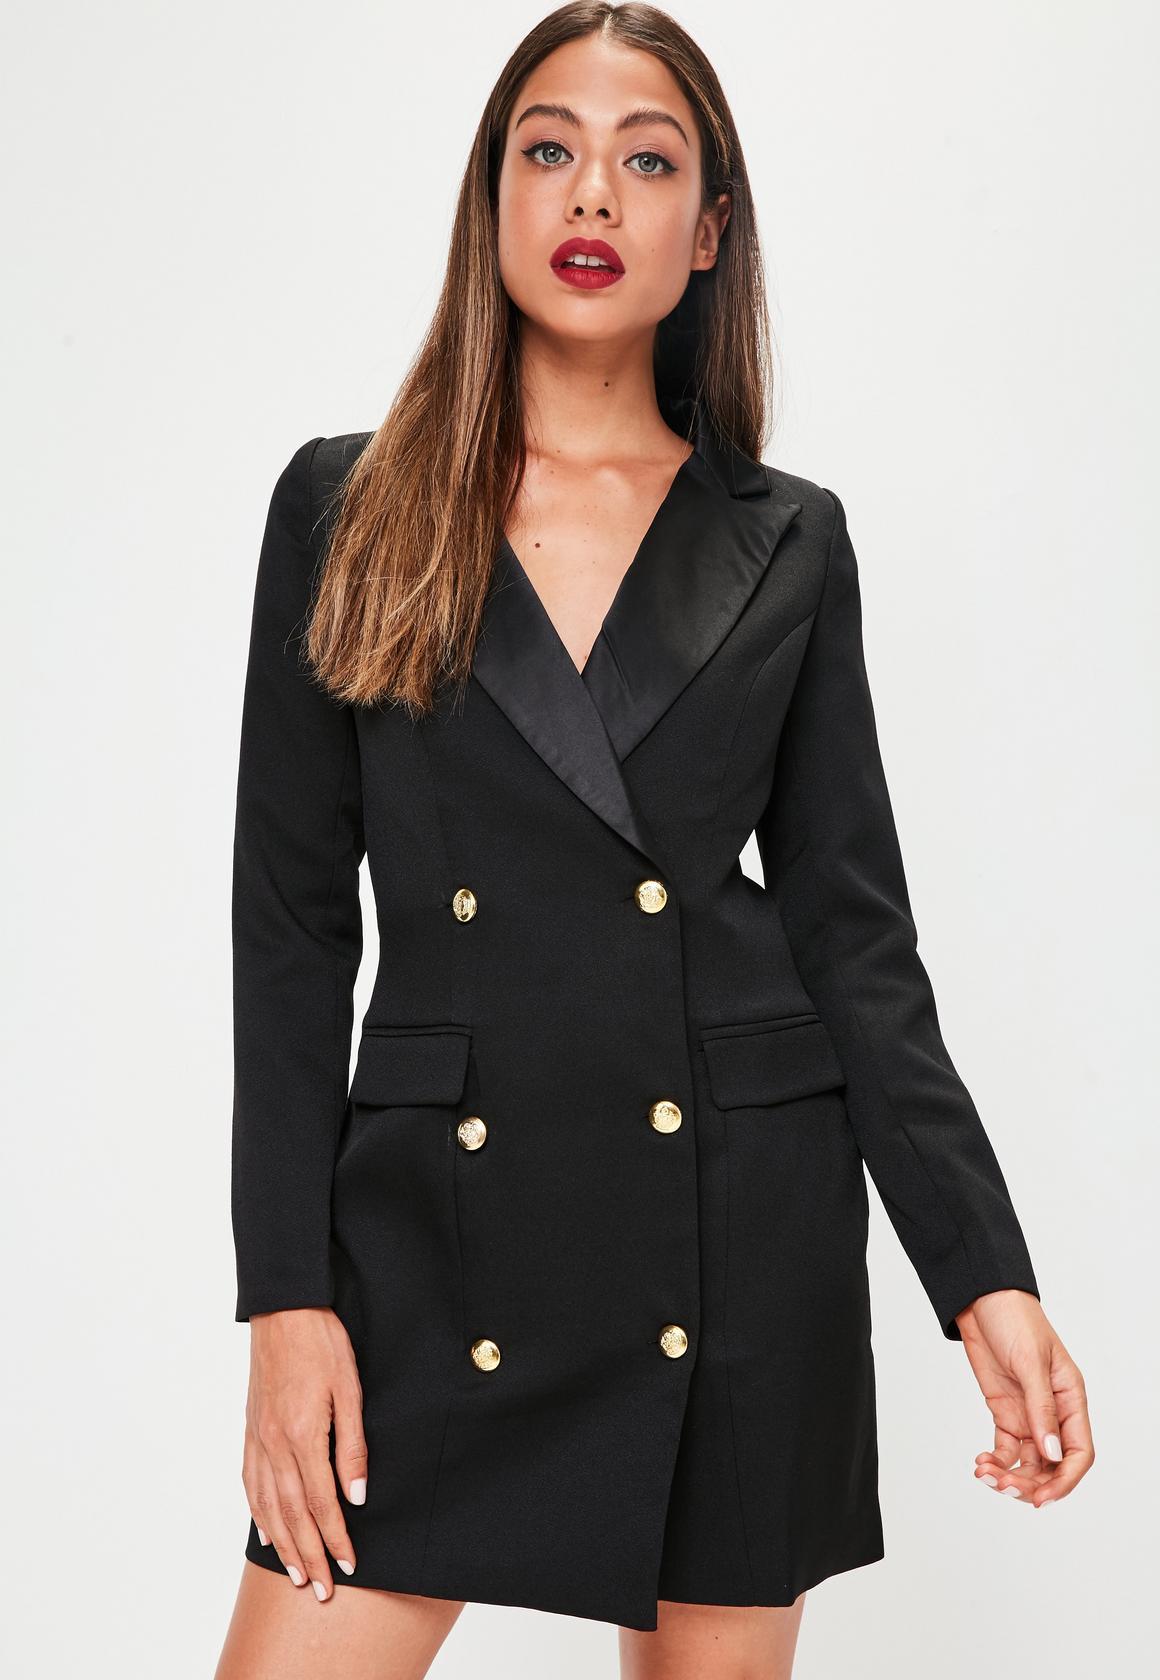 A Tuxedo Dress